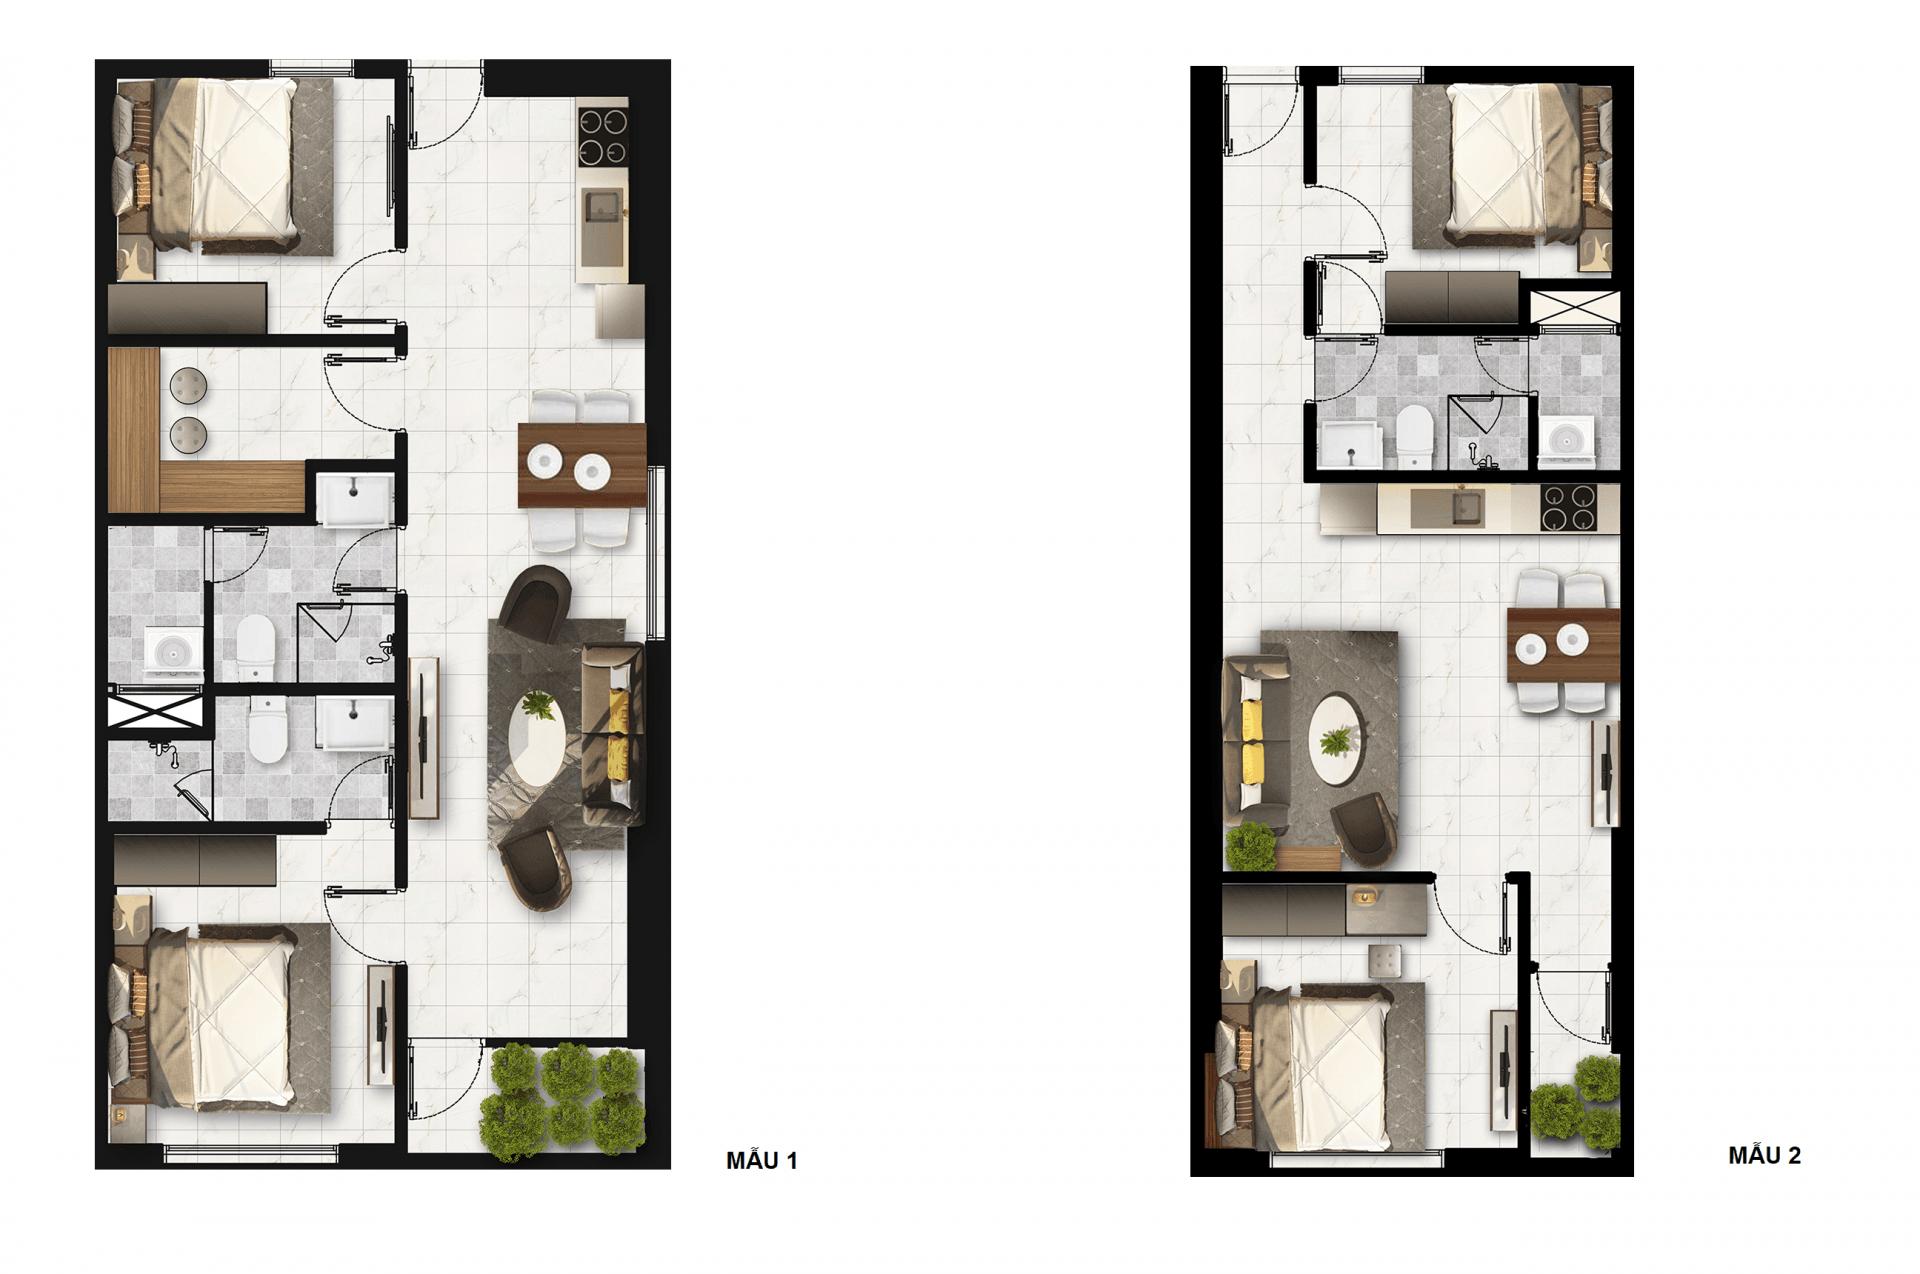 layout căn hộ napoleon caste - Dự án căn hộ Napoleon Castle Nha Trang